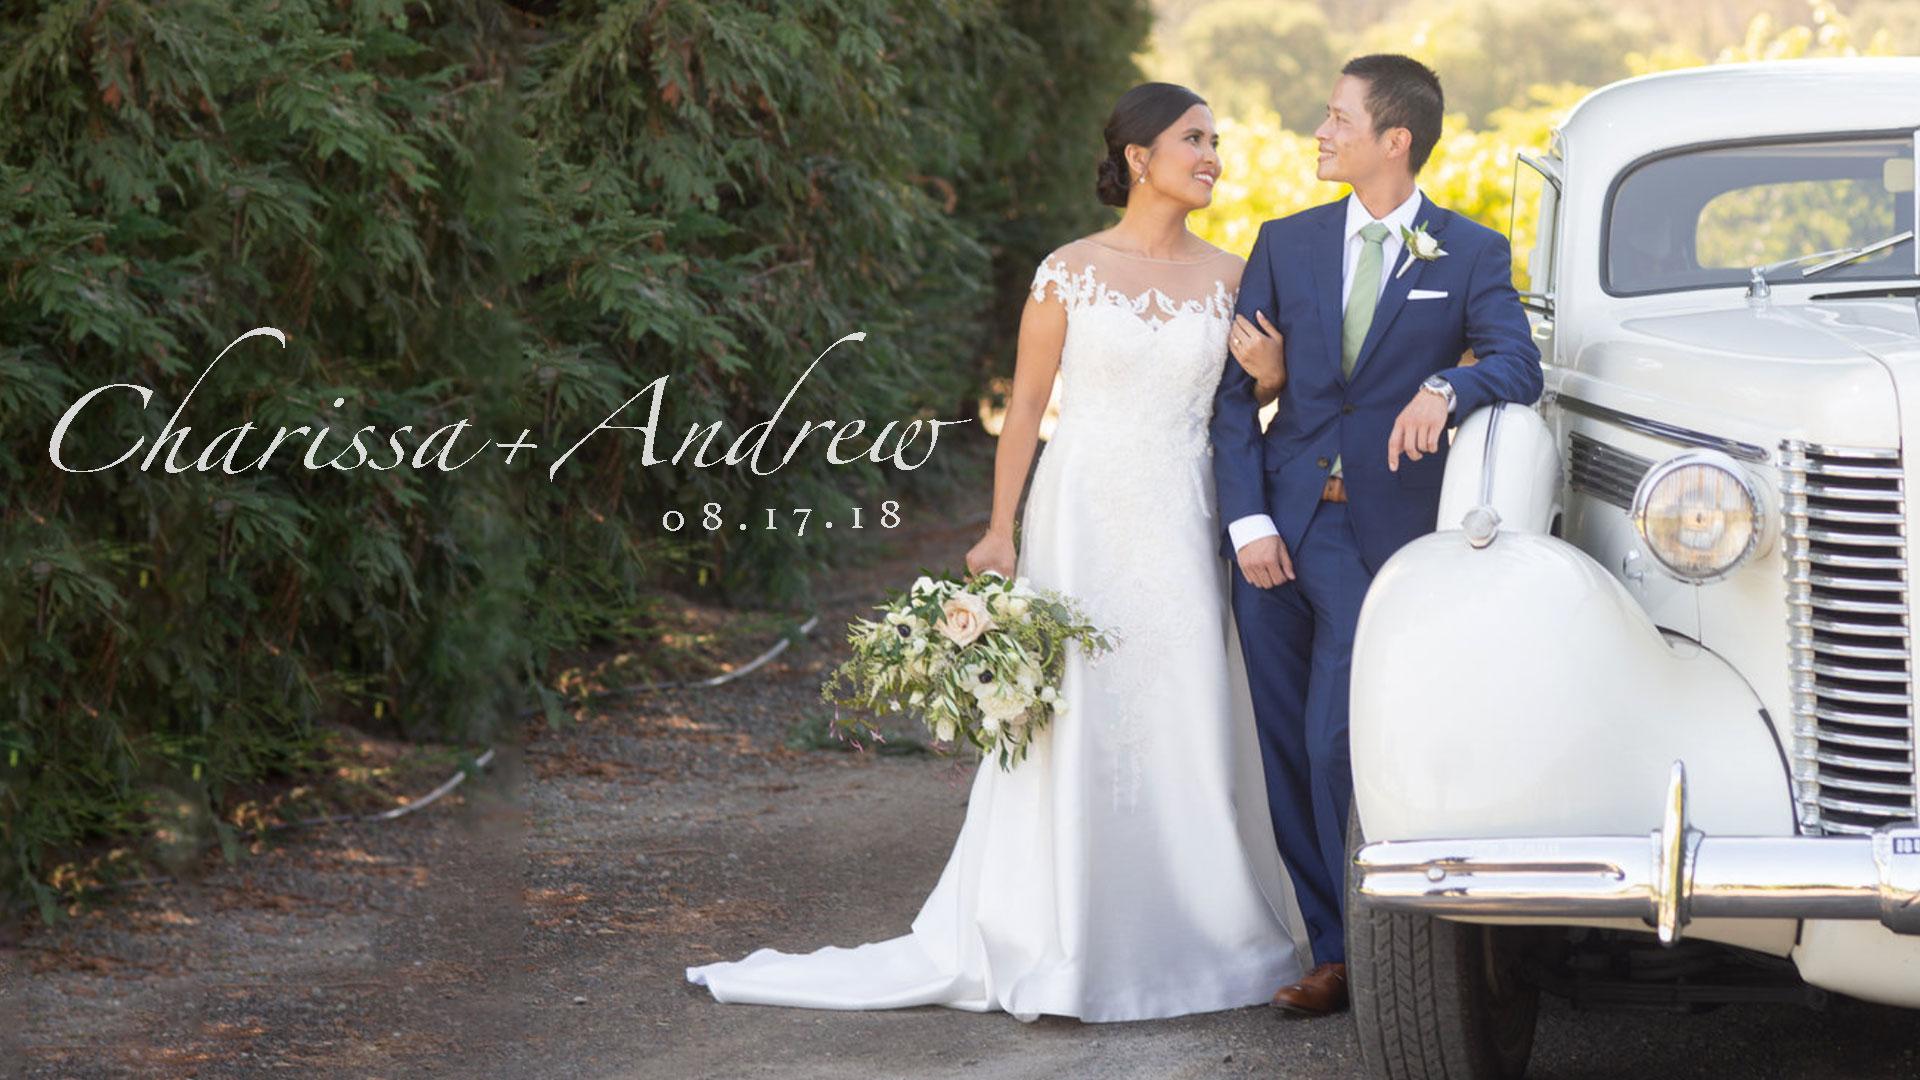 Charissa + Andrew | Geyserville, California | Trentadue